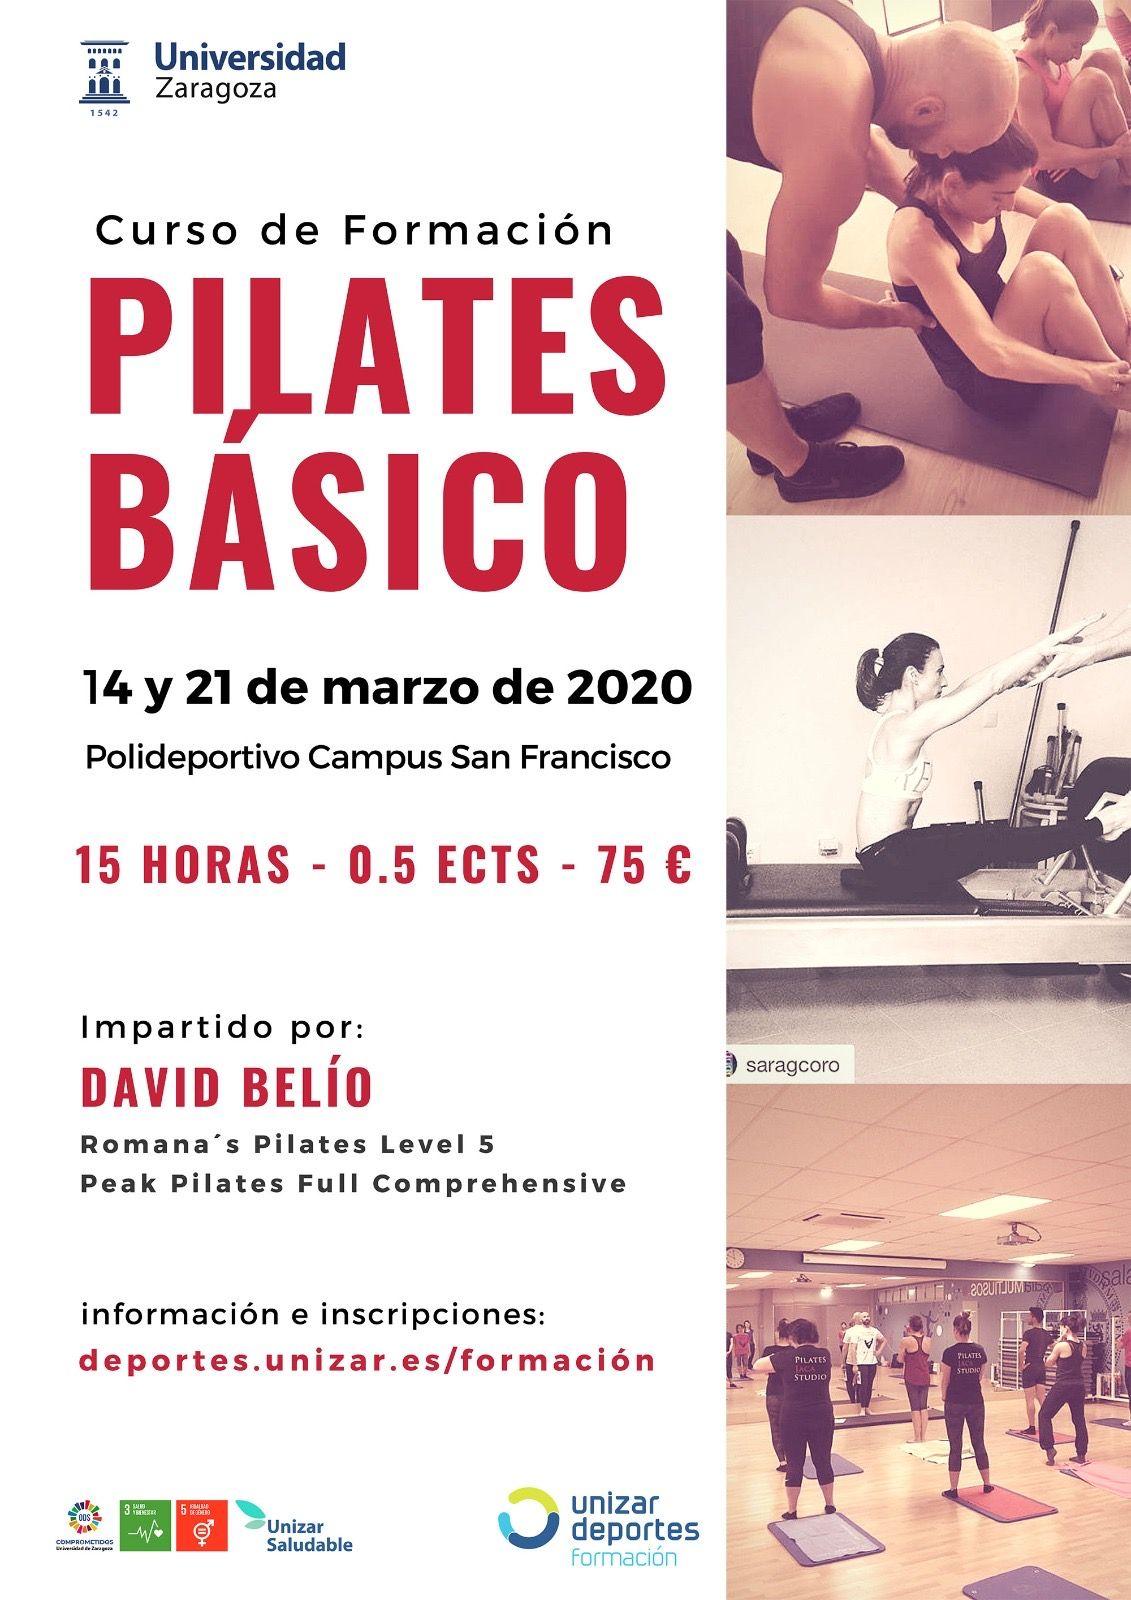 curso basico pilates zaragoza